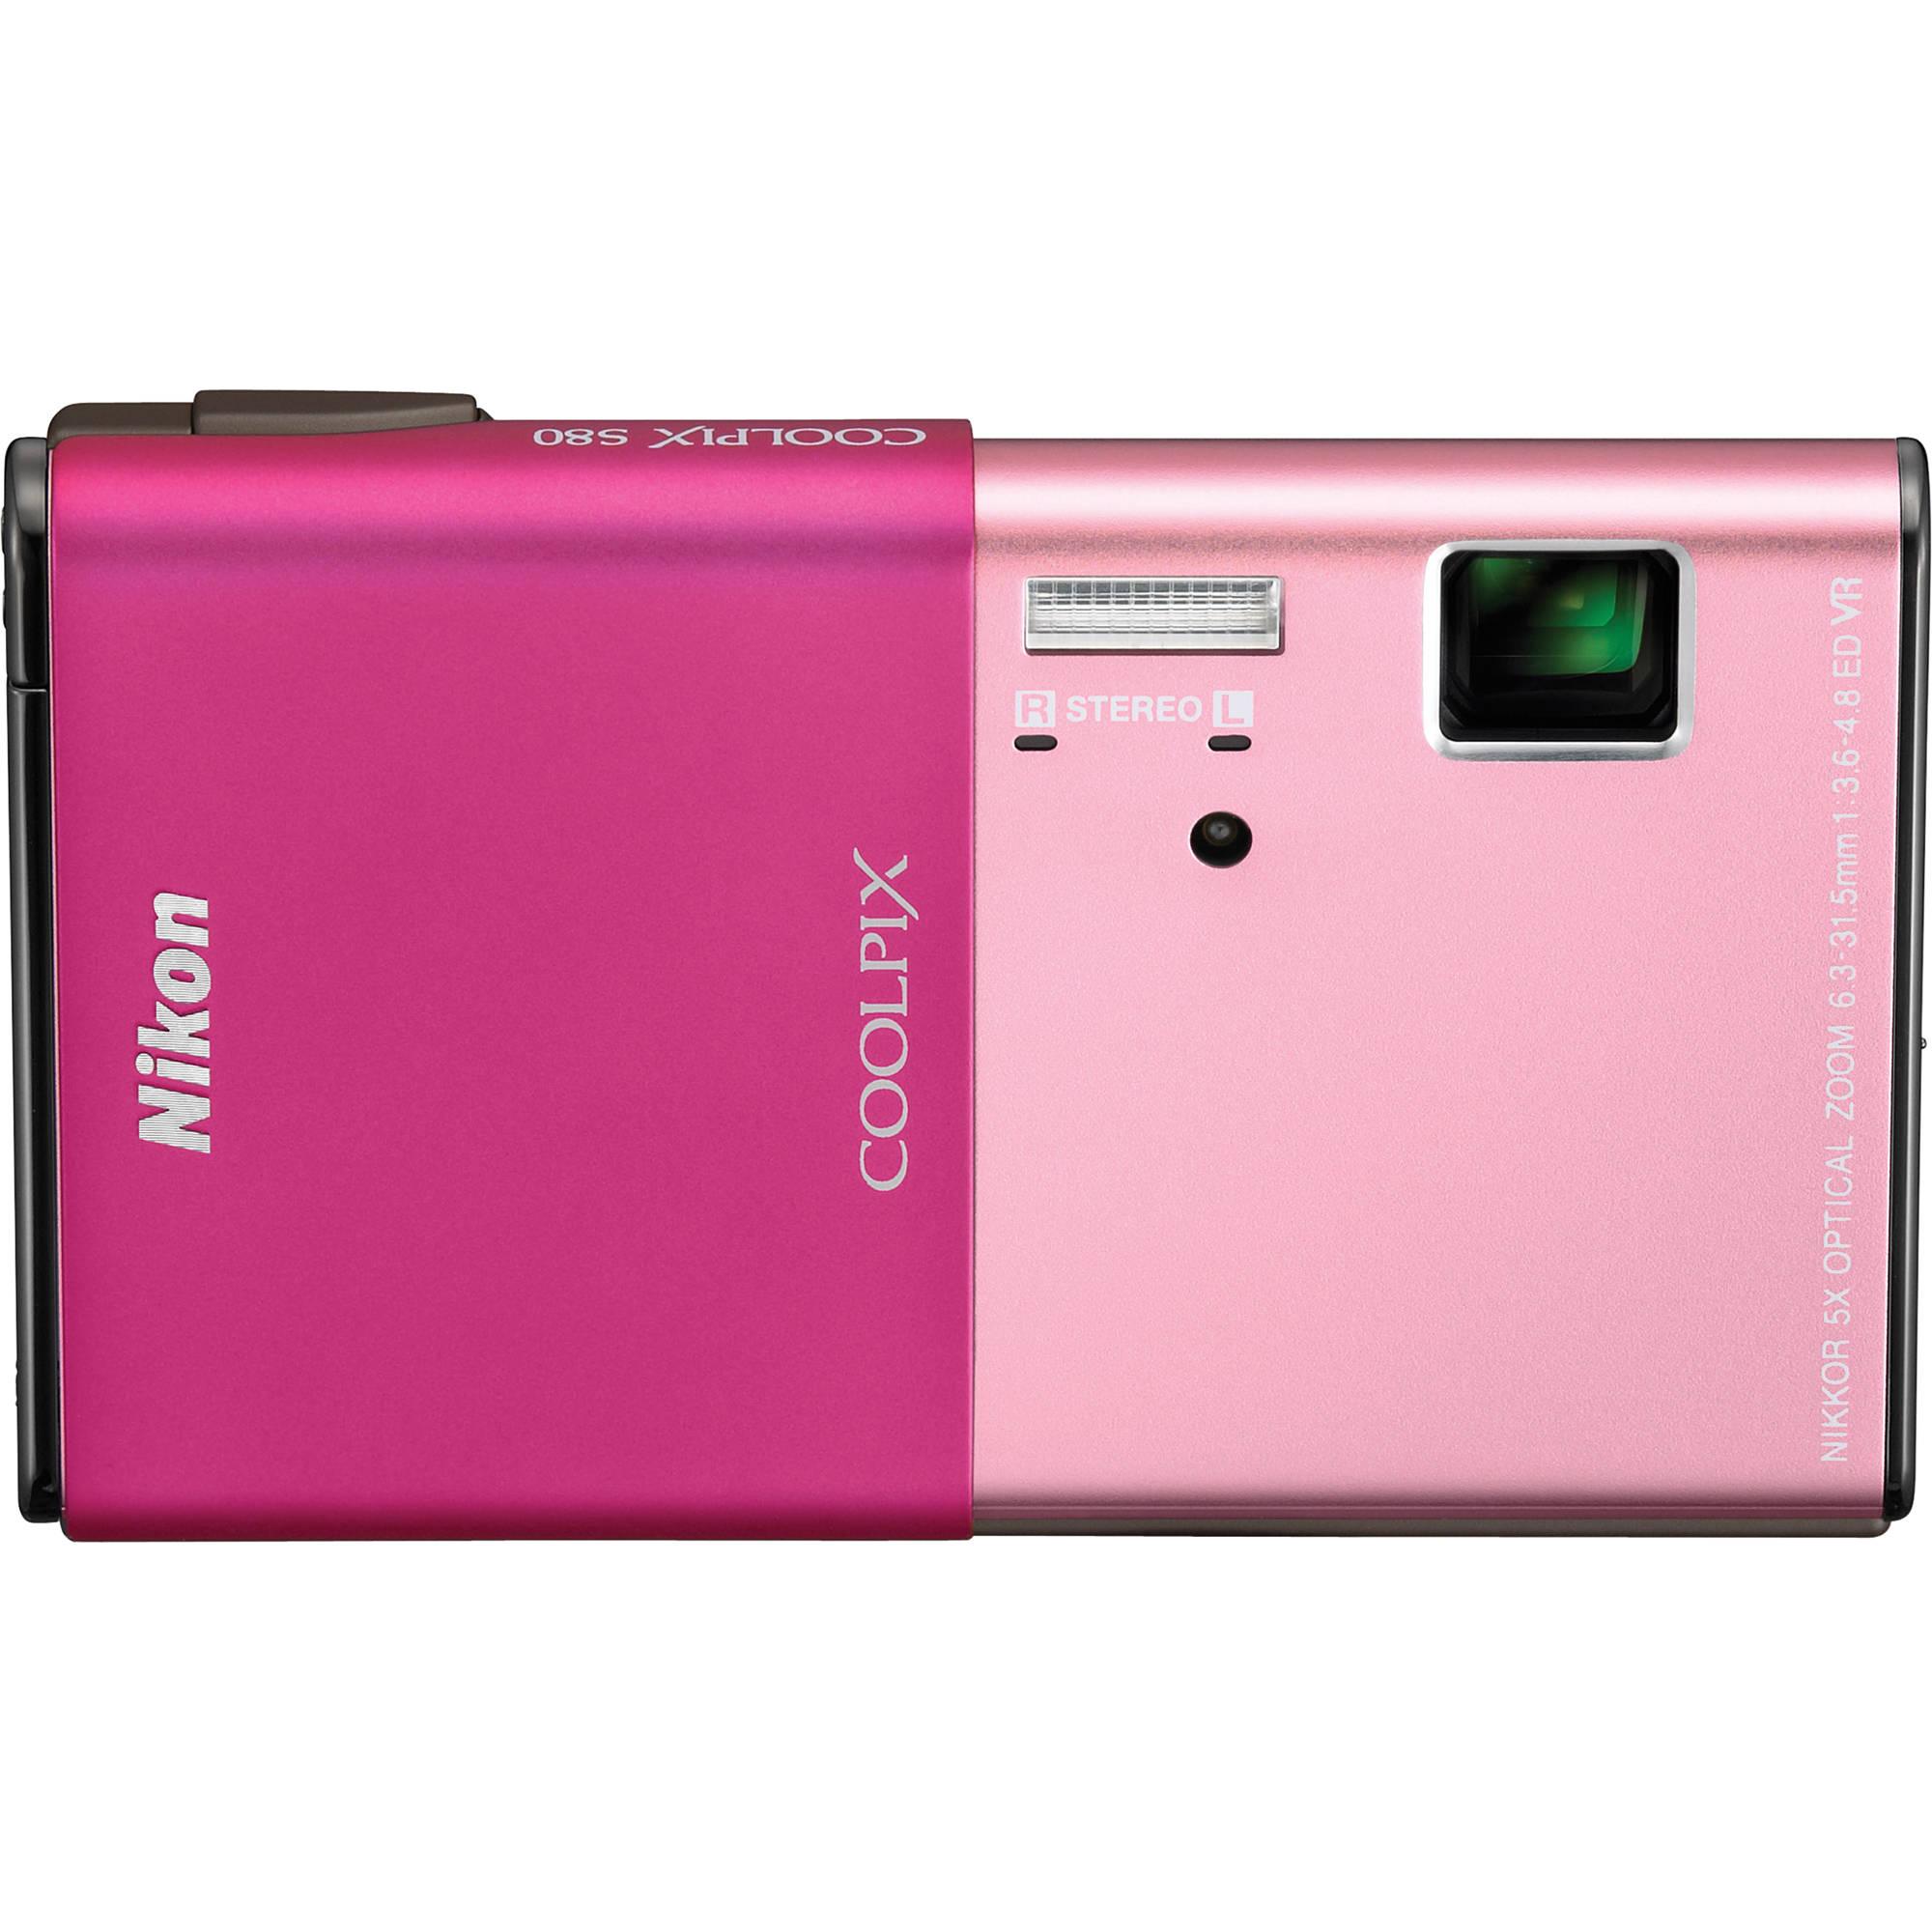 Nikon CoolPix S80 Digital Camera (Pink) 26230 B&H Photo Video